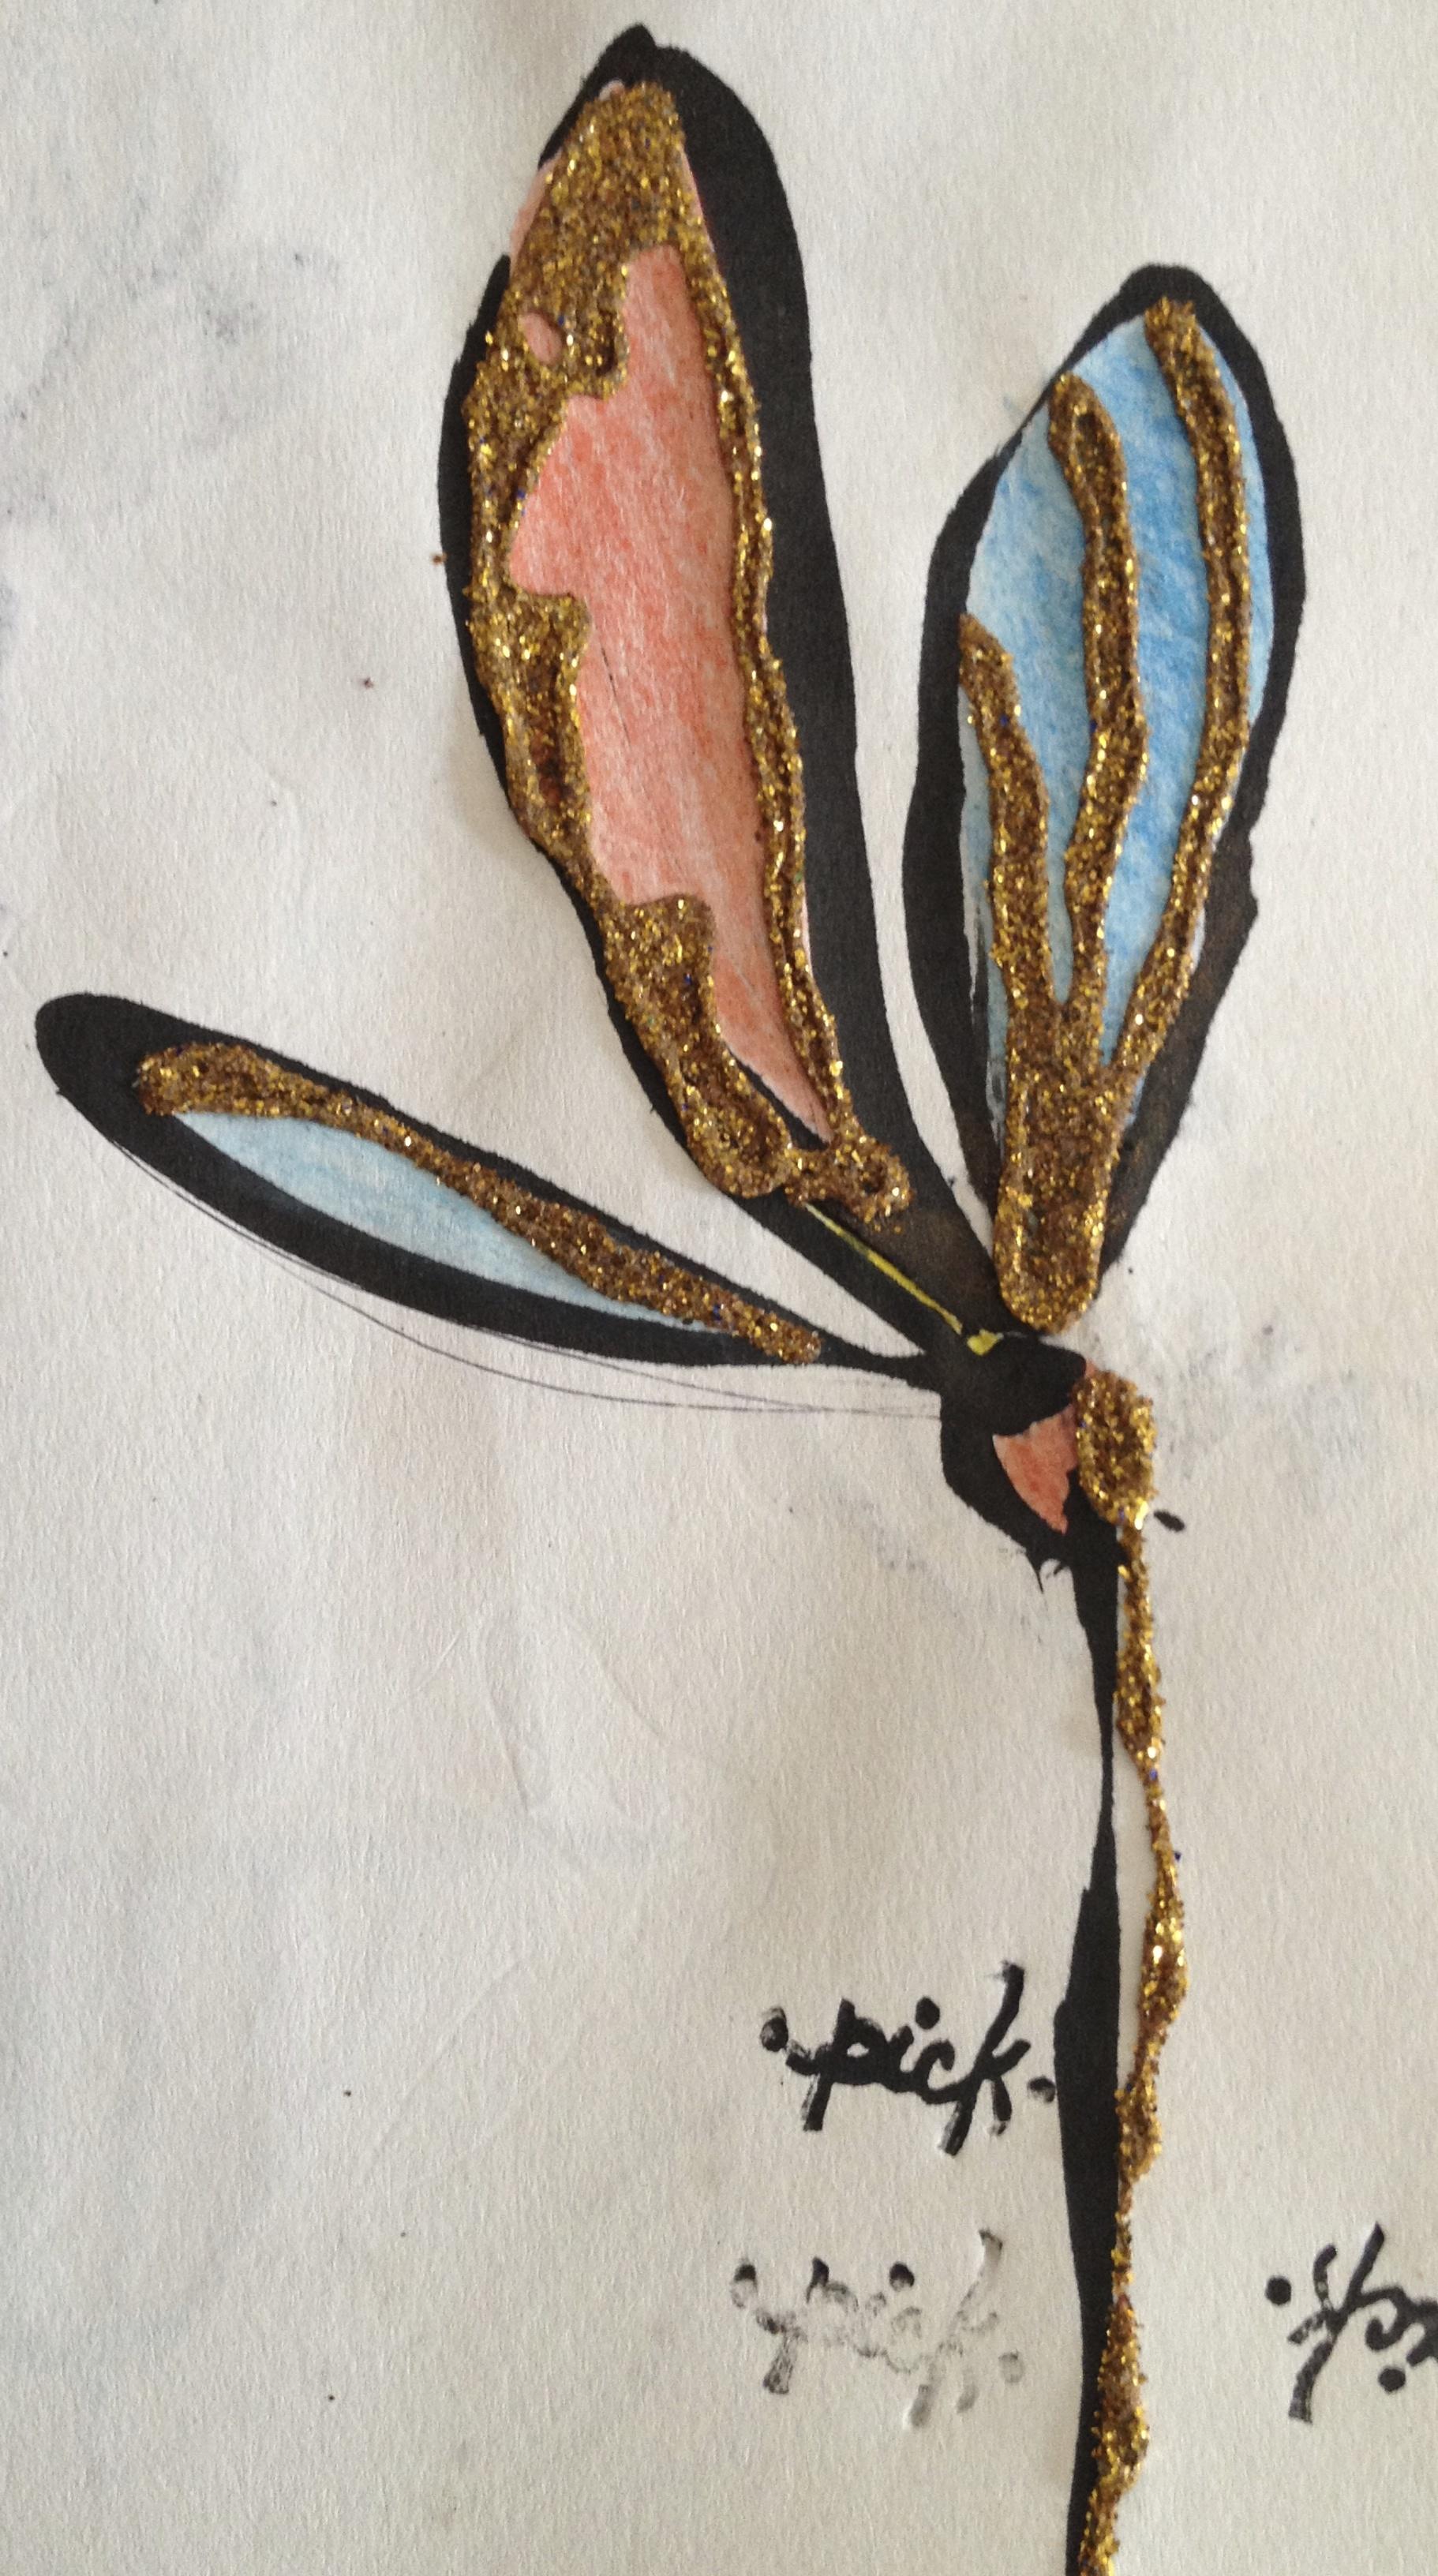 Ink, color pencil, glitter, sketchbook, Varanasi, 2013